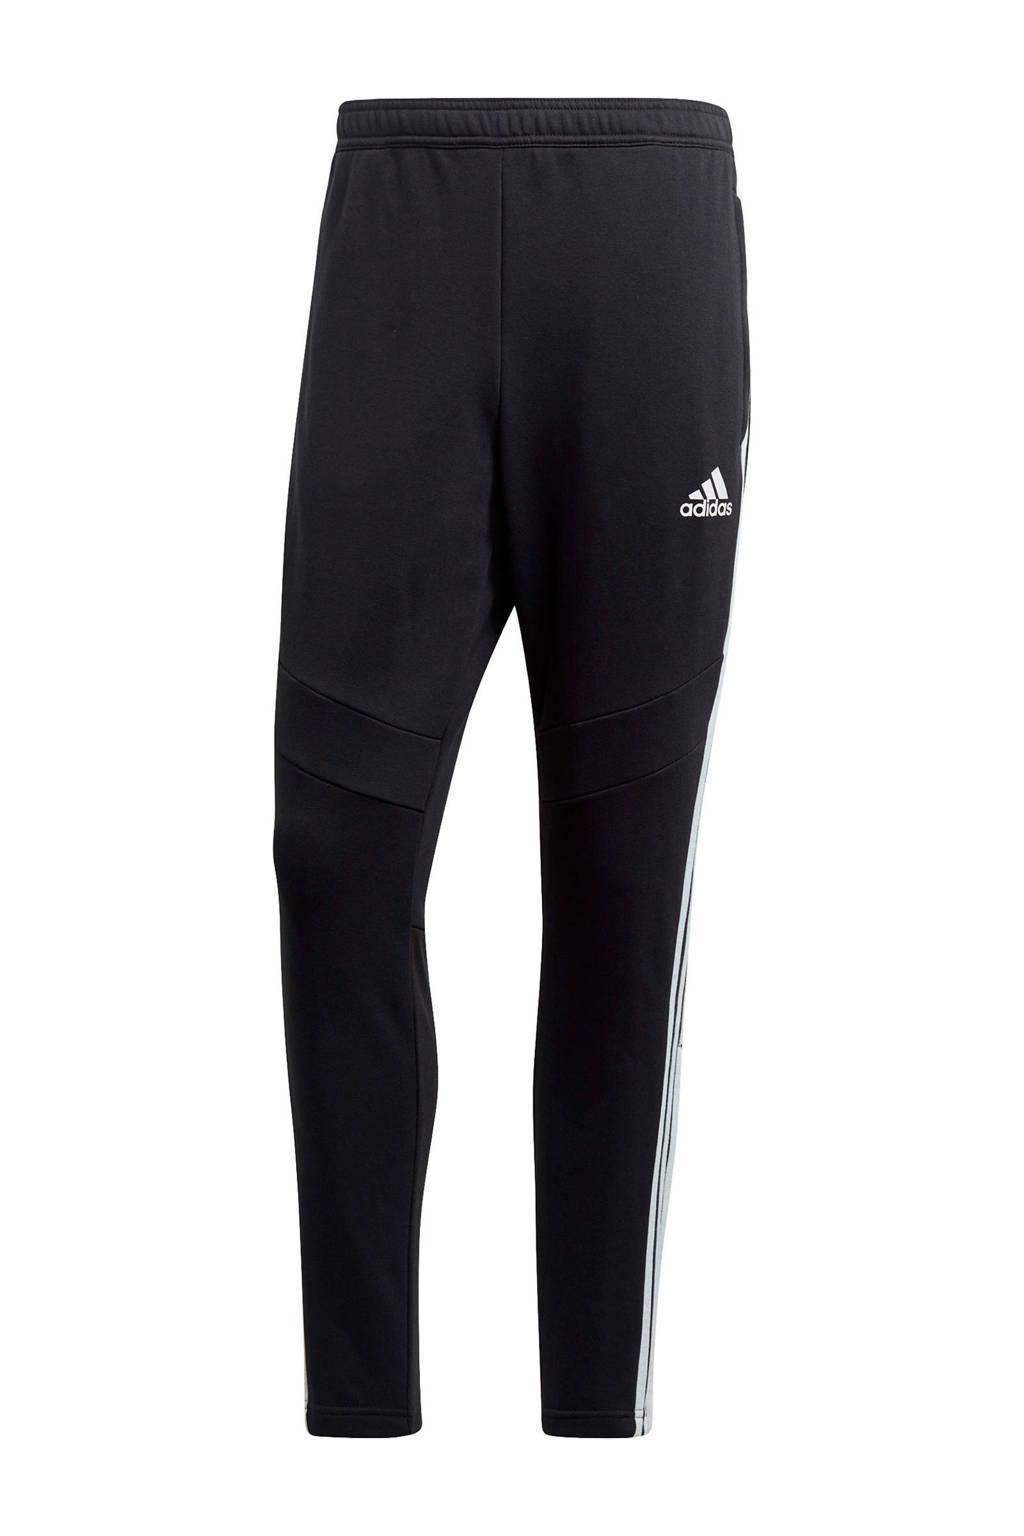 adidas Senior  sportbroek Tiro 19 ft zwart, Zwart, Heren